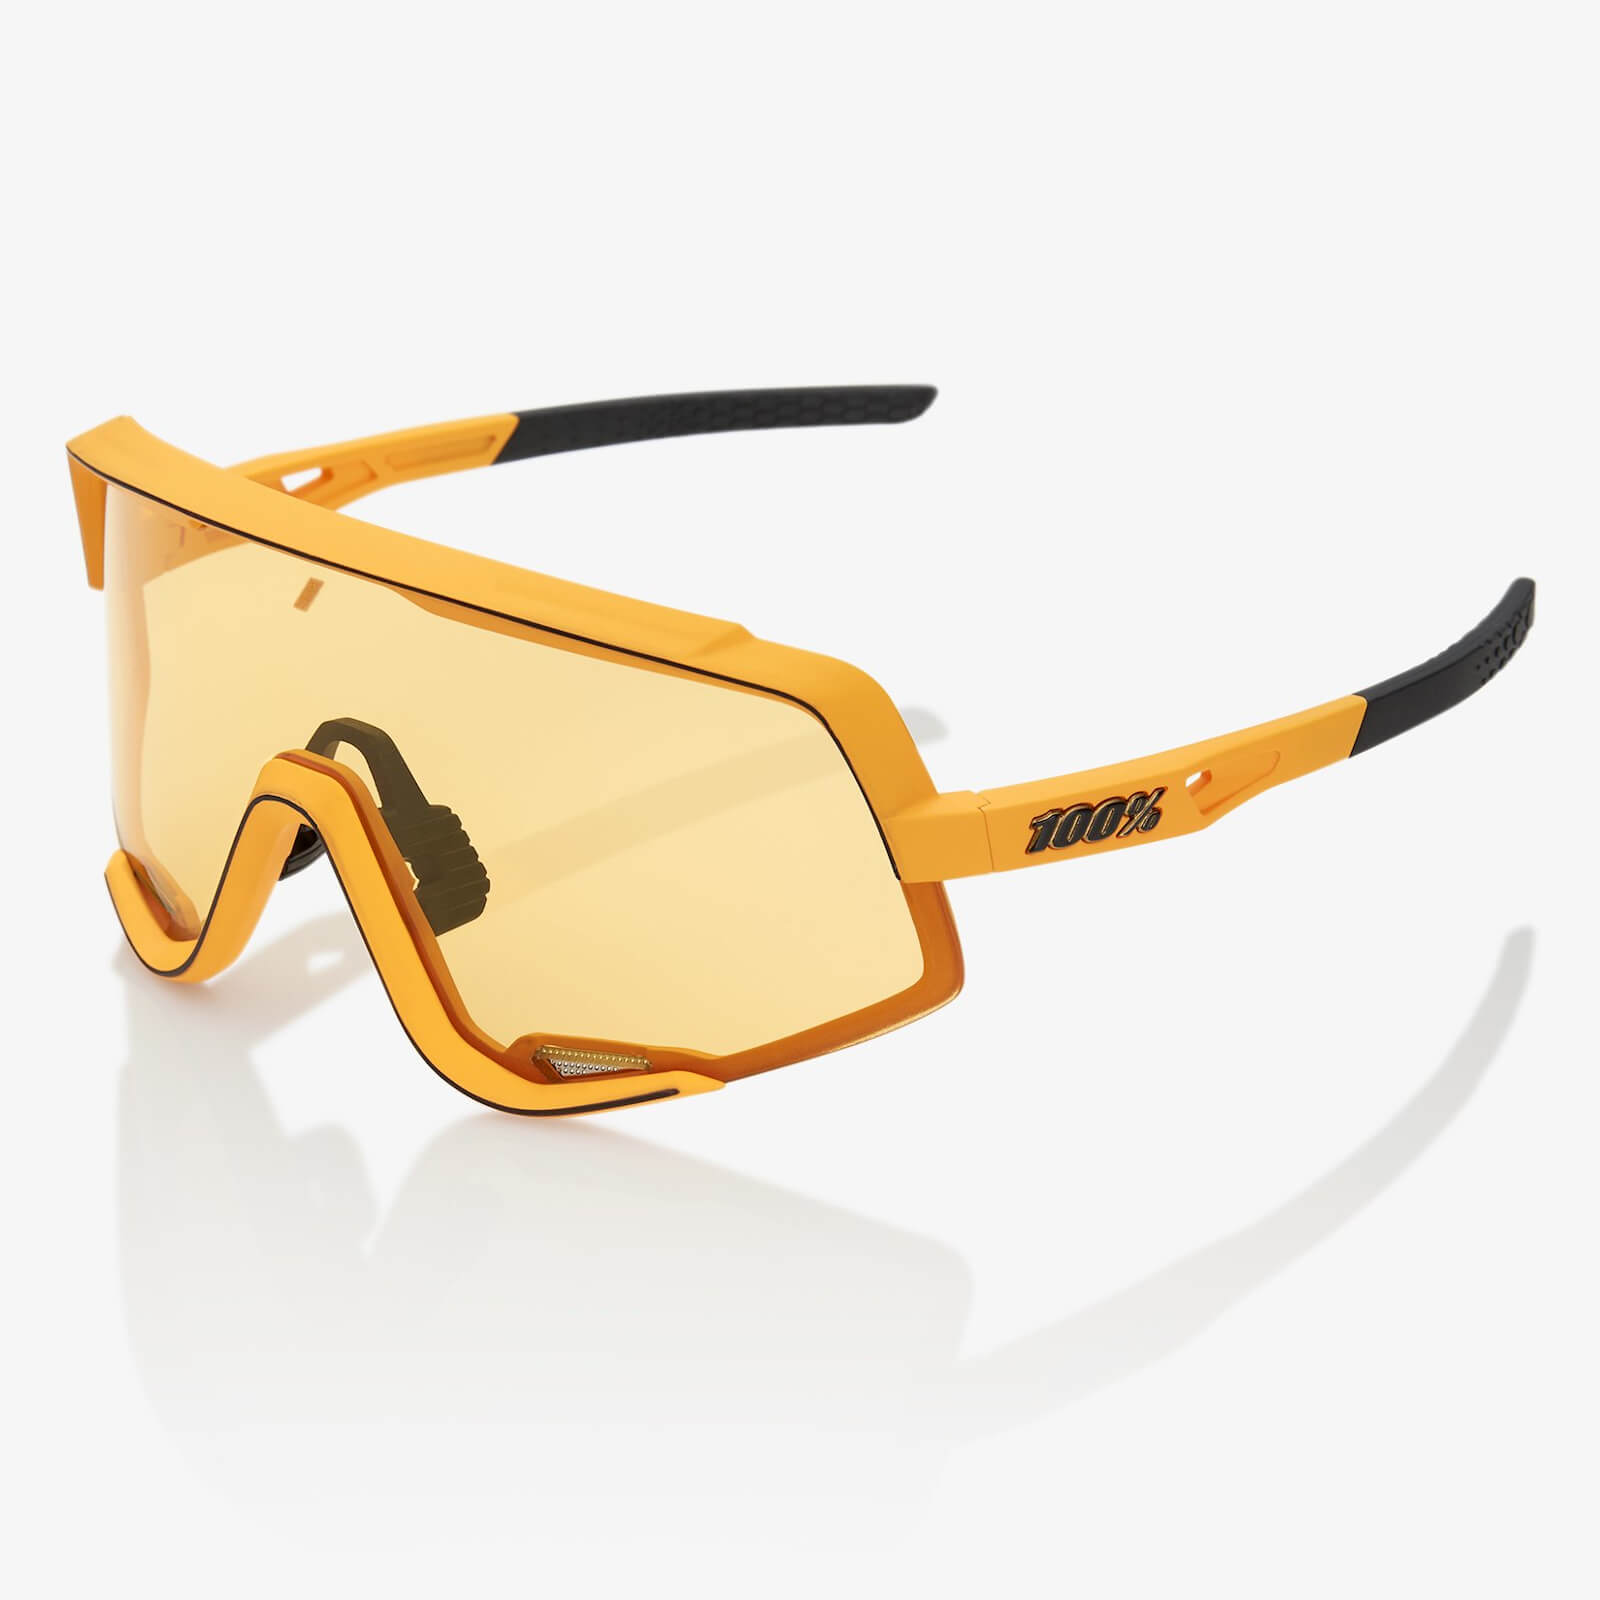 100% Glendale Sunglasses - Soft Tact Mustard/Yellow Lens